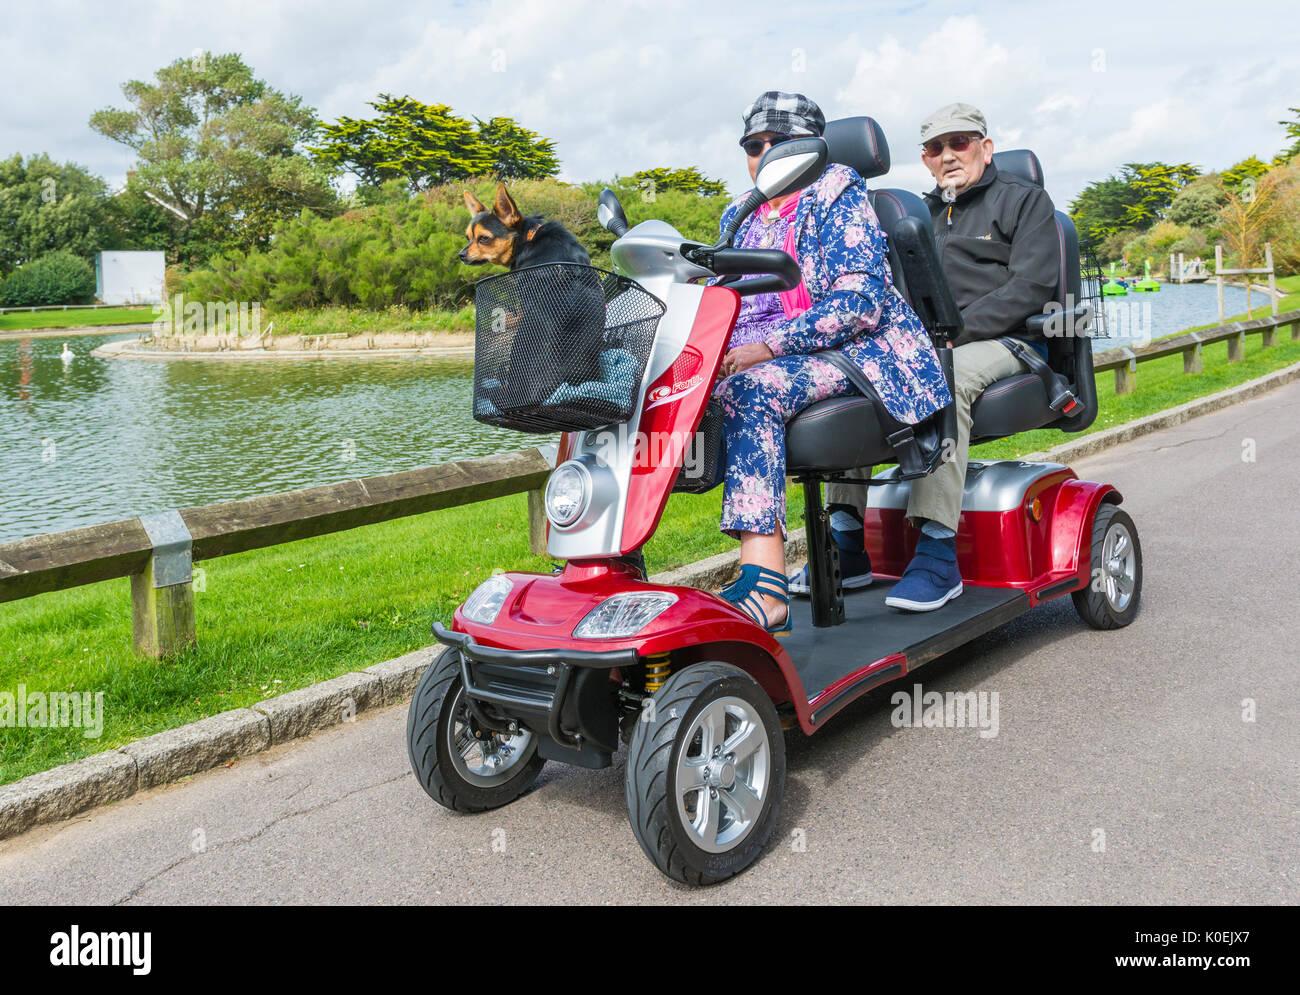 mobility scooter elderly photos mobility scooter elderly images alamy. Black Bedroom Furniture Sets. Home Design Ideas